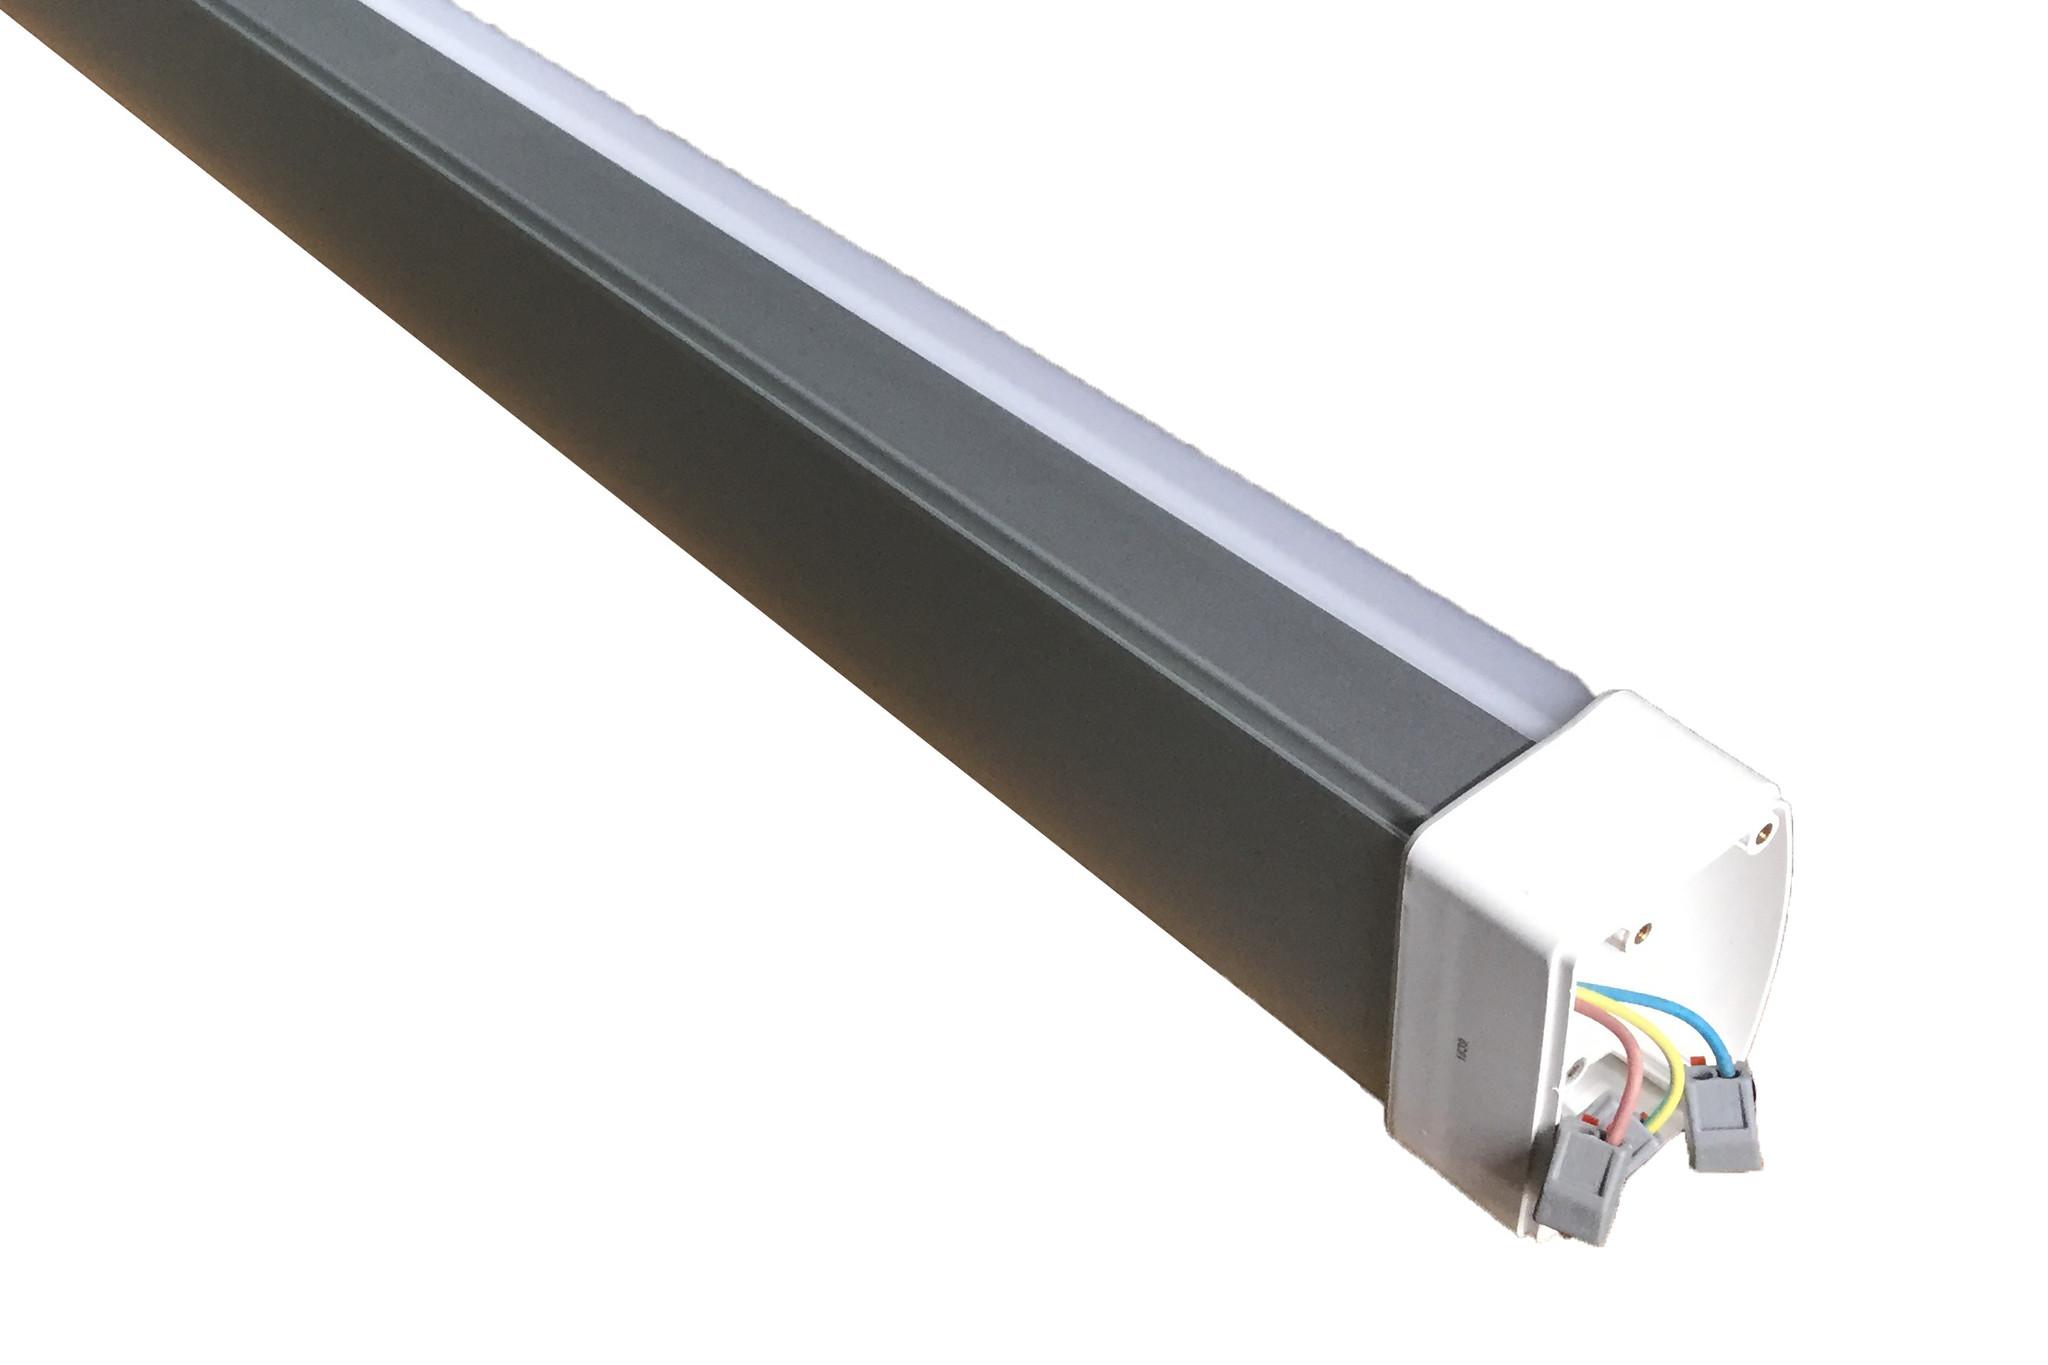 LED Tri-Proof 50W, IP65, 1500mm, Aluminium